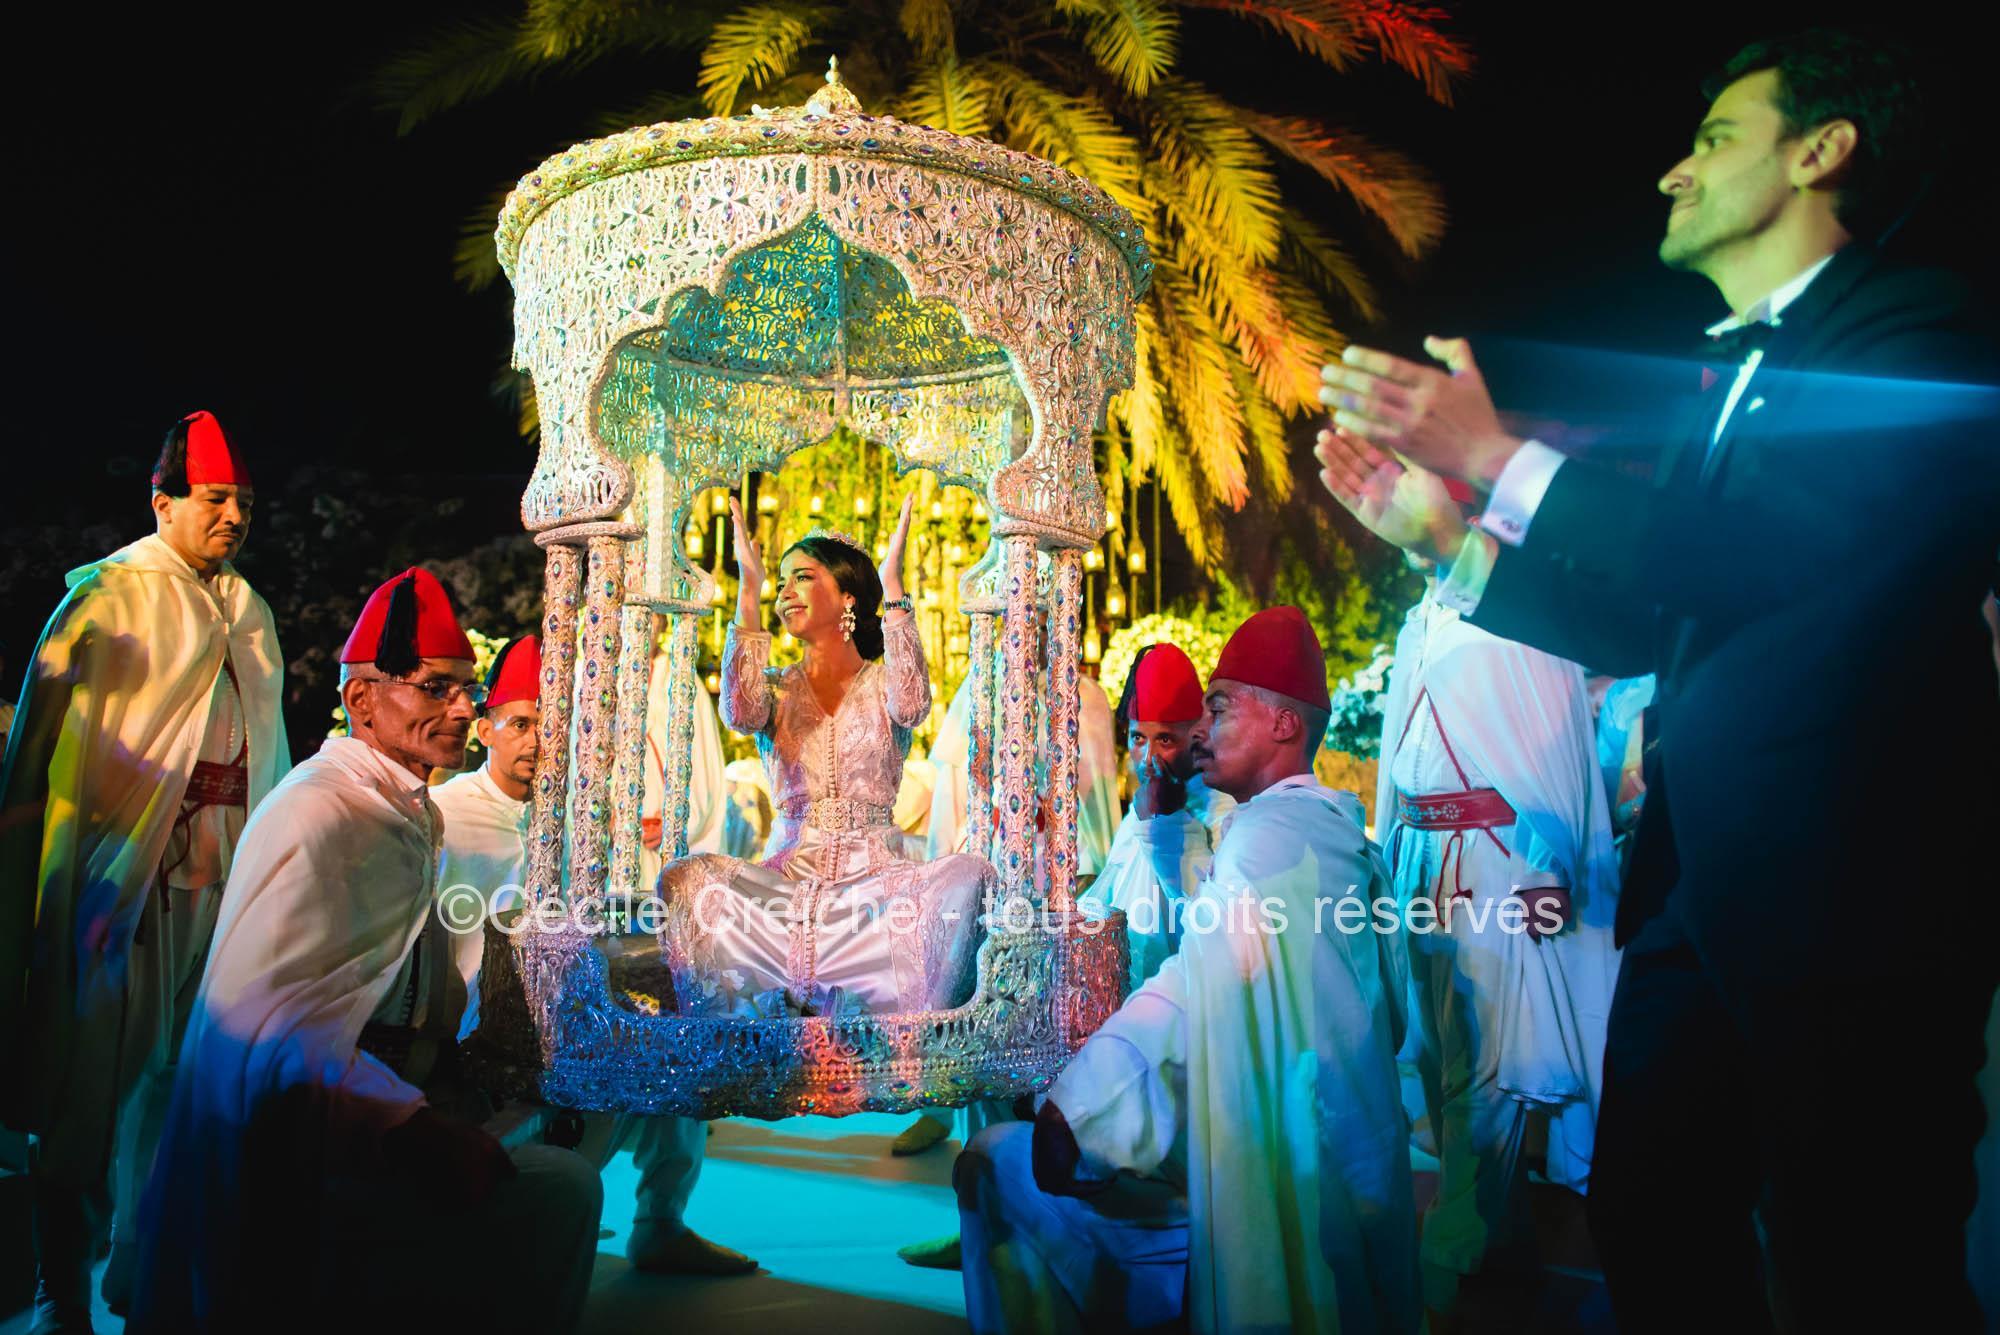 Photographe de mariage maroc